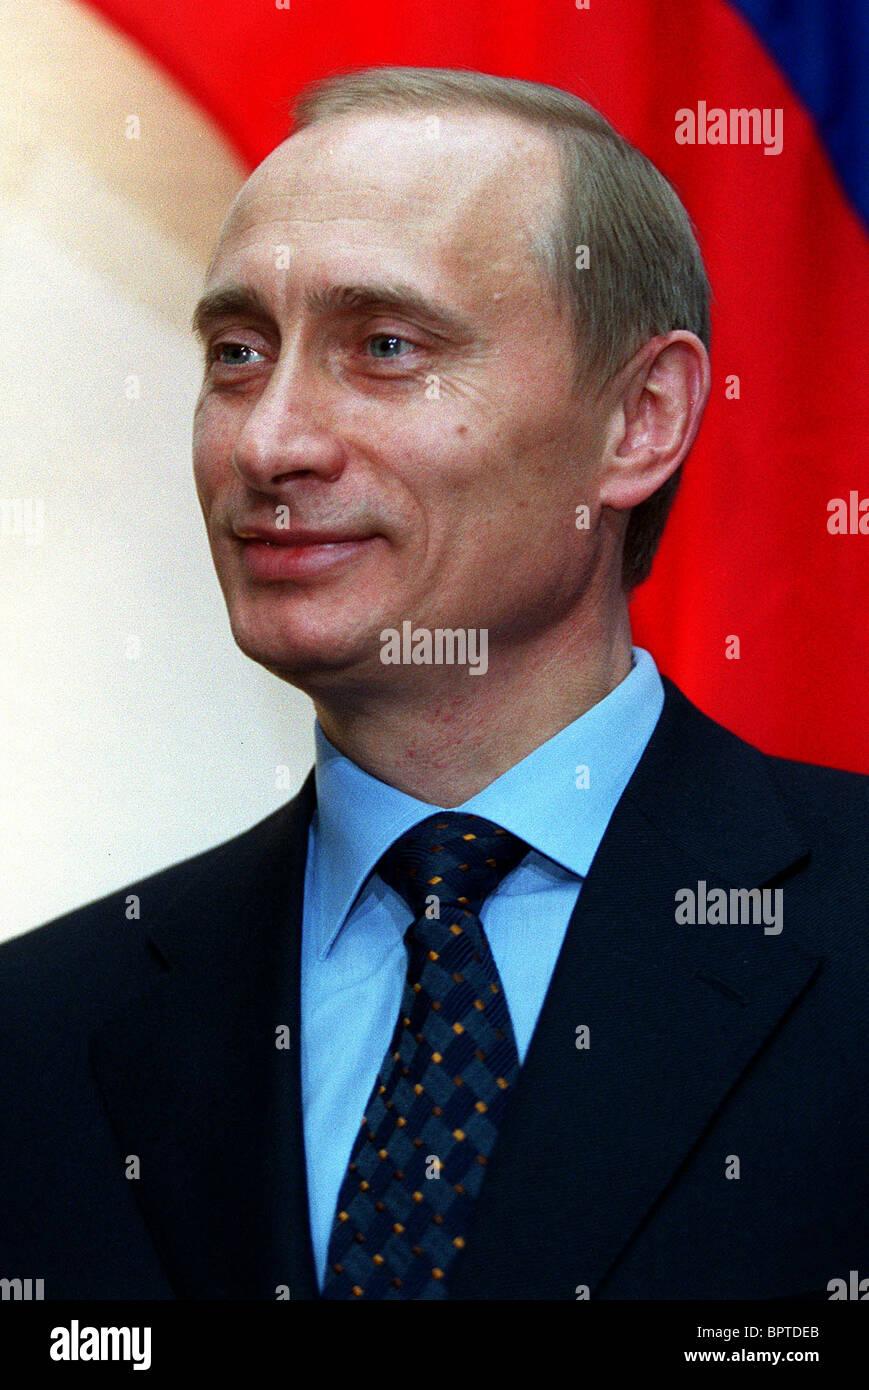 VLADIMIR PUTIN PRESIDENT OF RUSSIA 17 April 2000 - Stock Image